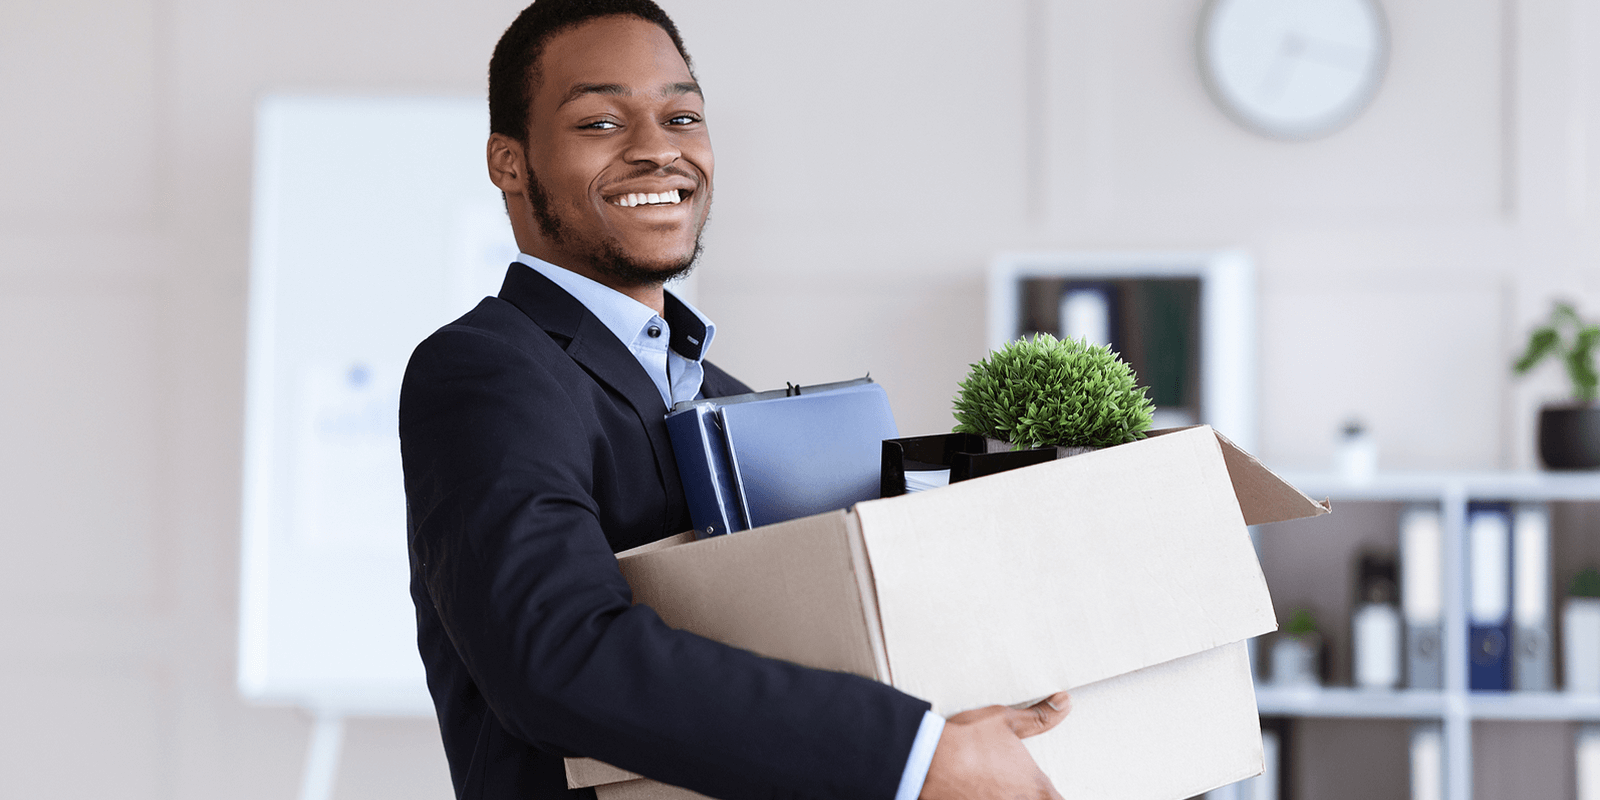 5 Reasons Insurance Agency is a Good Career Choice for Millennials